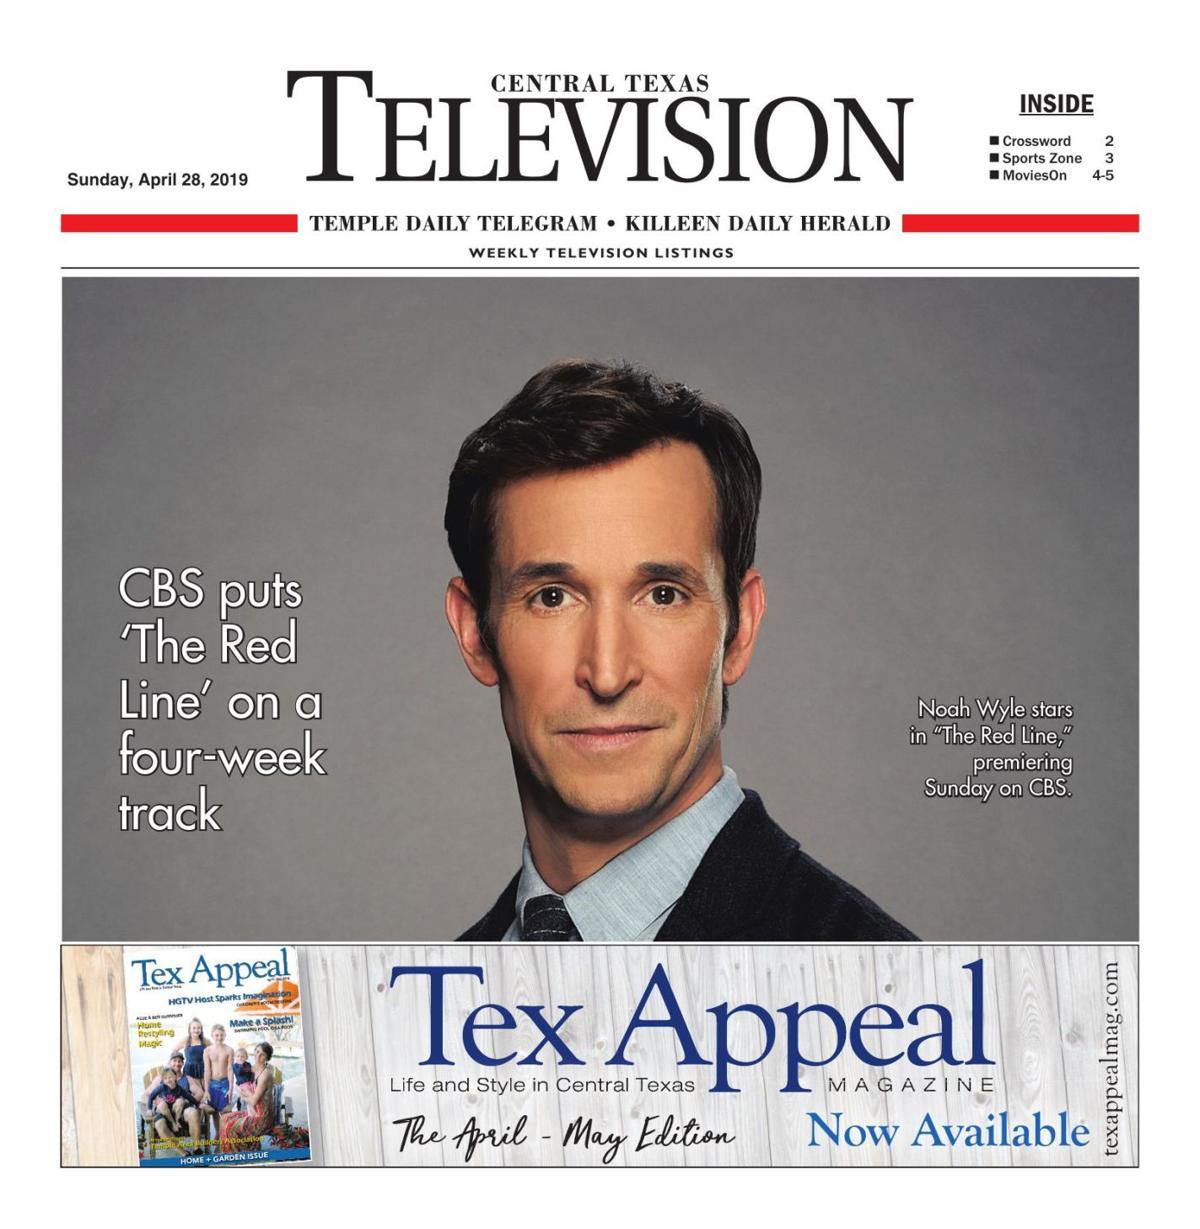 TV Book April 28th- May 4th